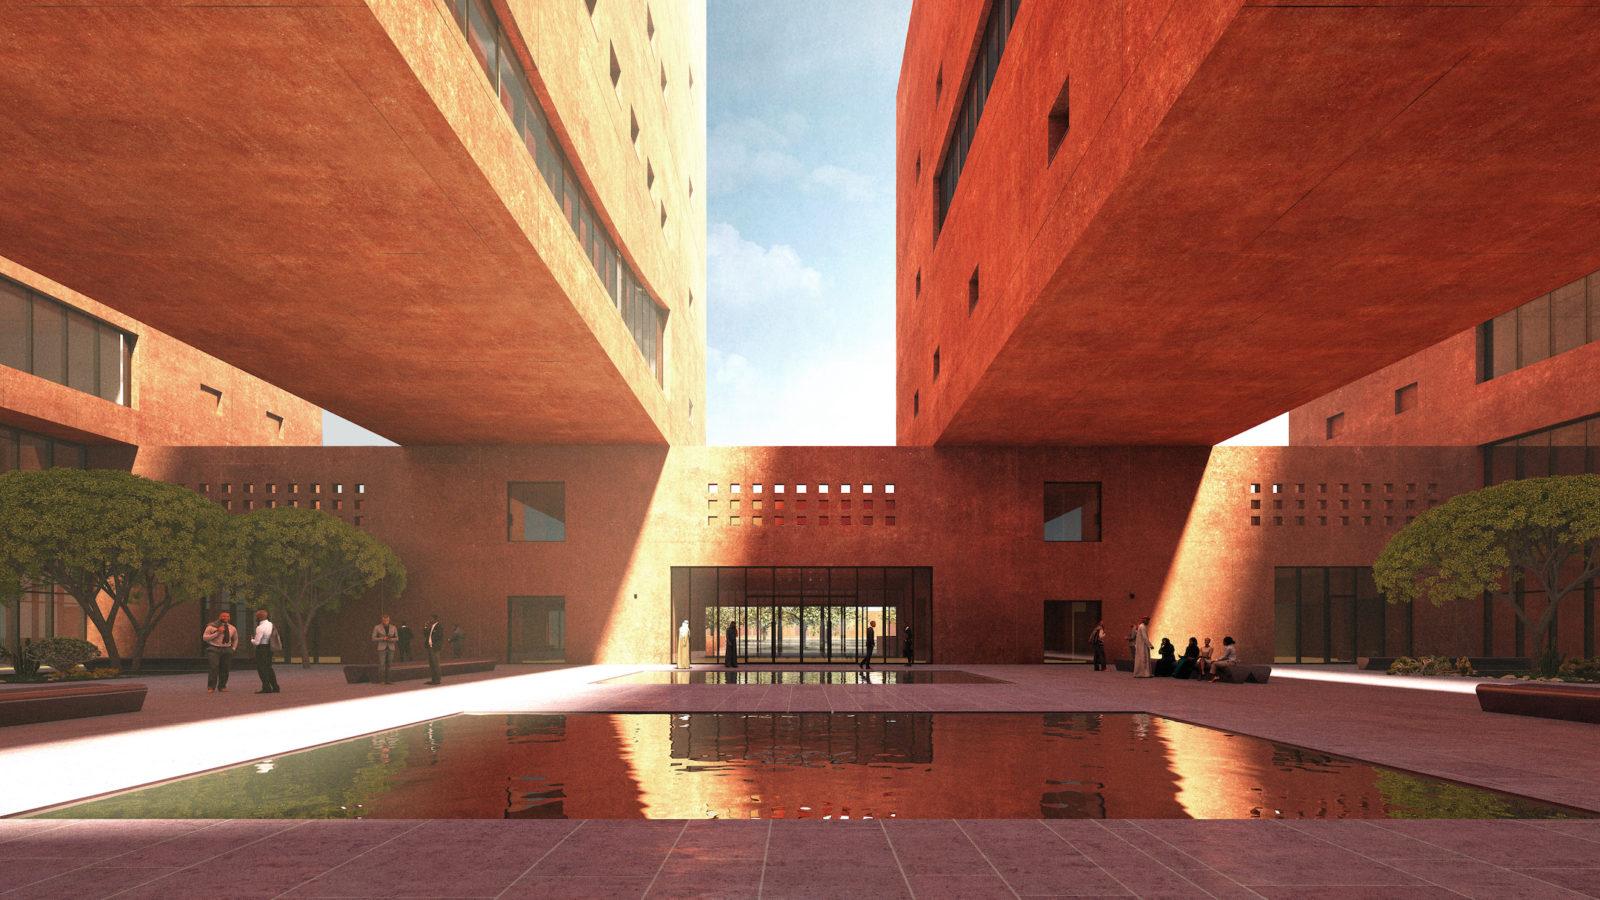 Award-winning Ghanaian-British Architect Sir David Adjaye's Star is Ascendant and Bright